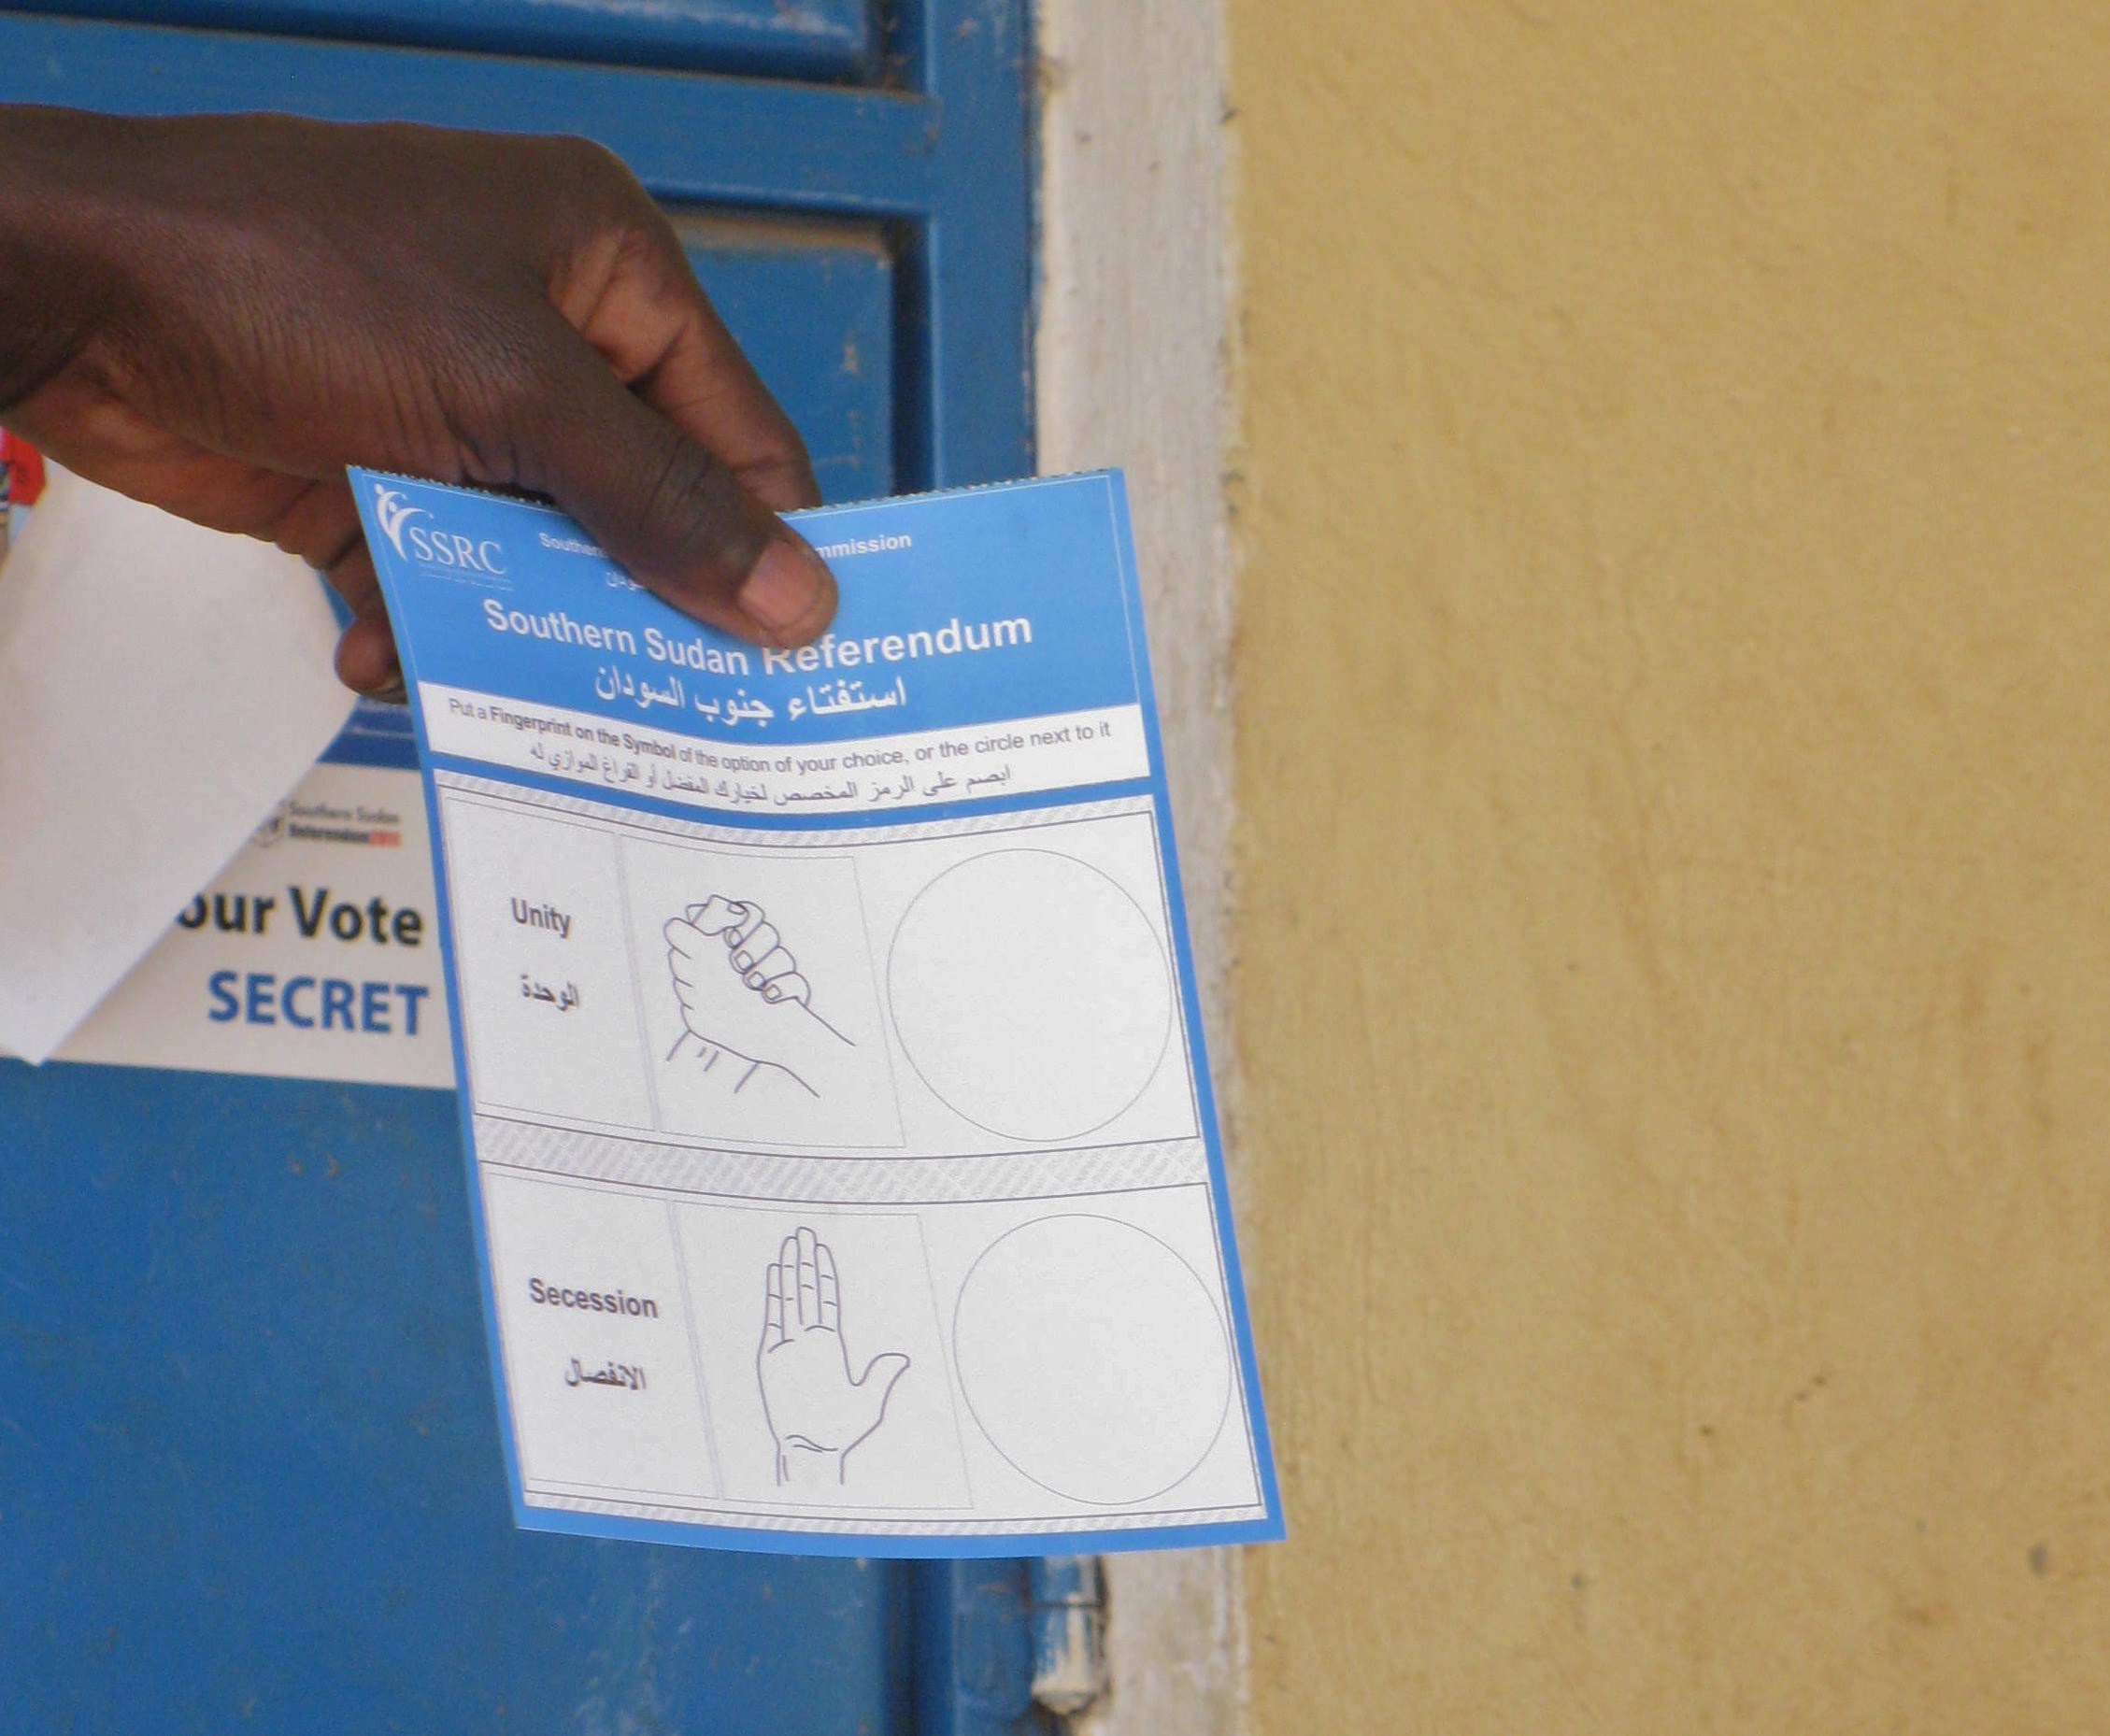 South Sudan Referendum Ballot